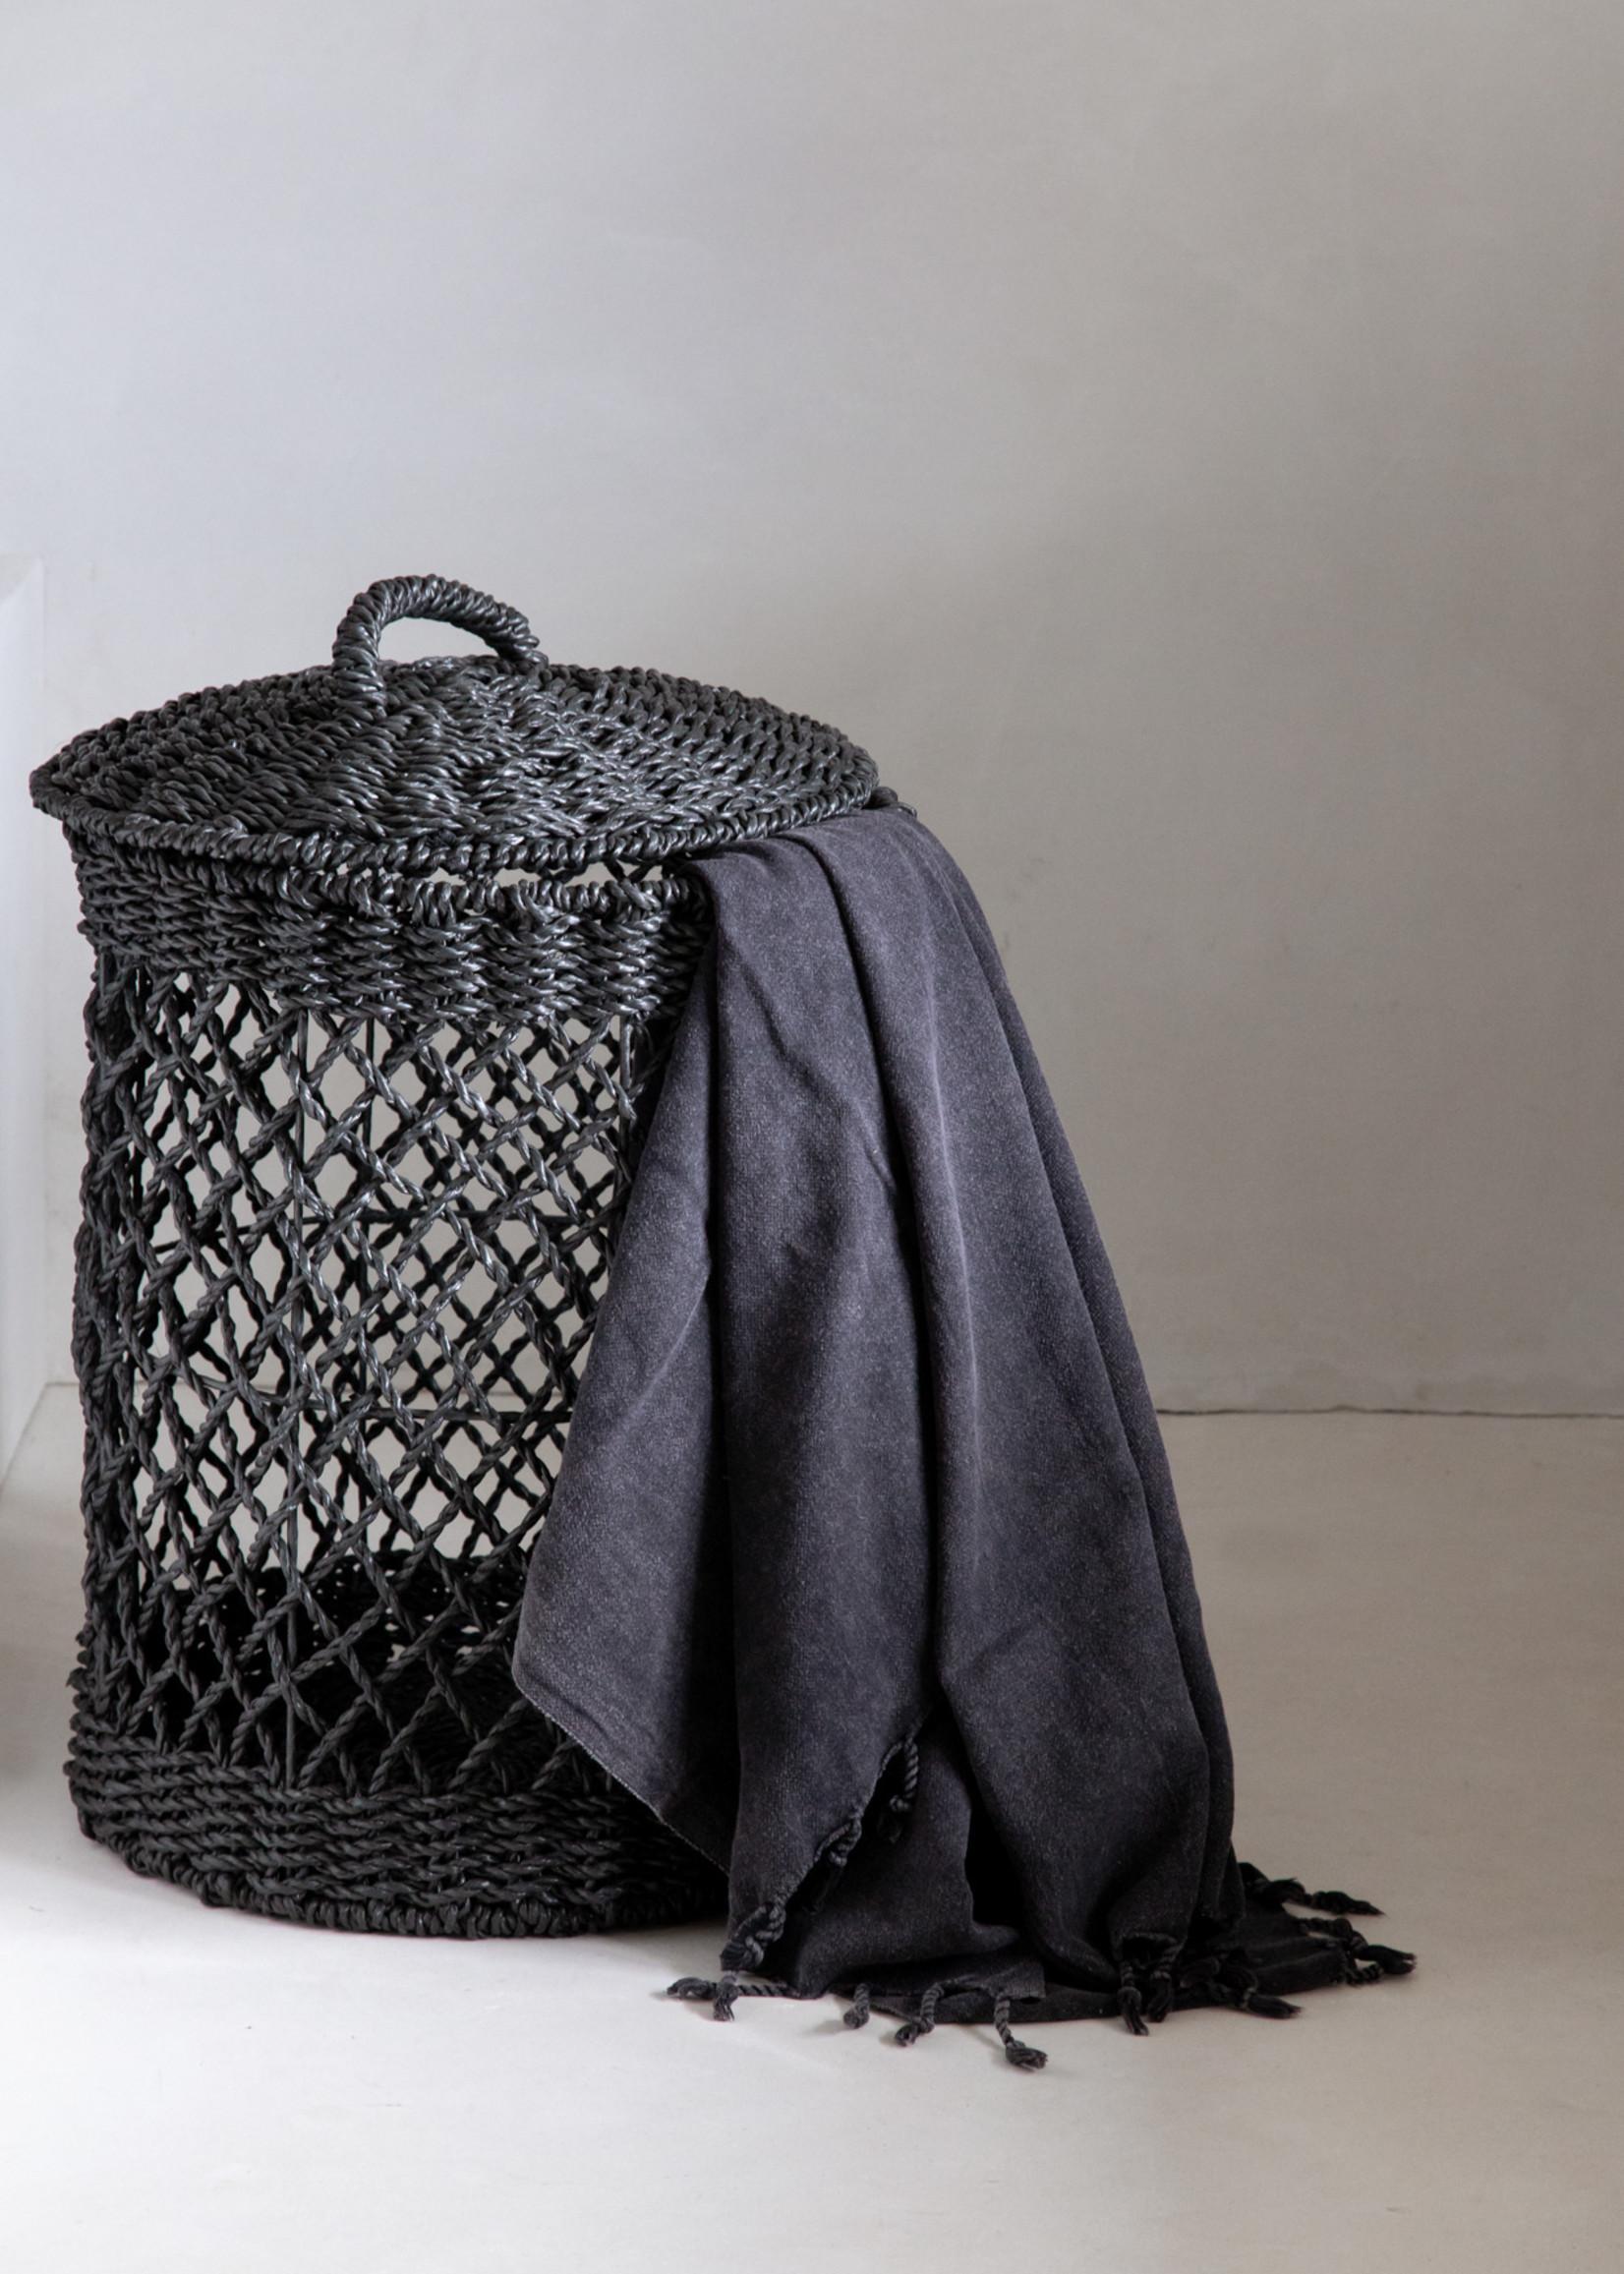 The Laundry Basket - Black - L